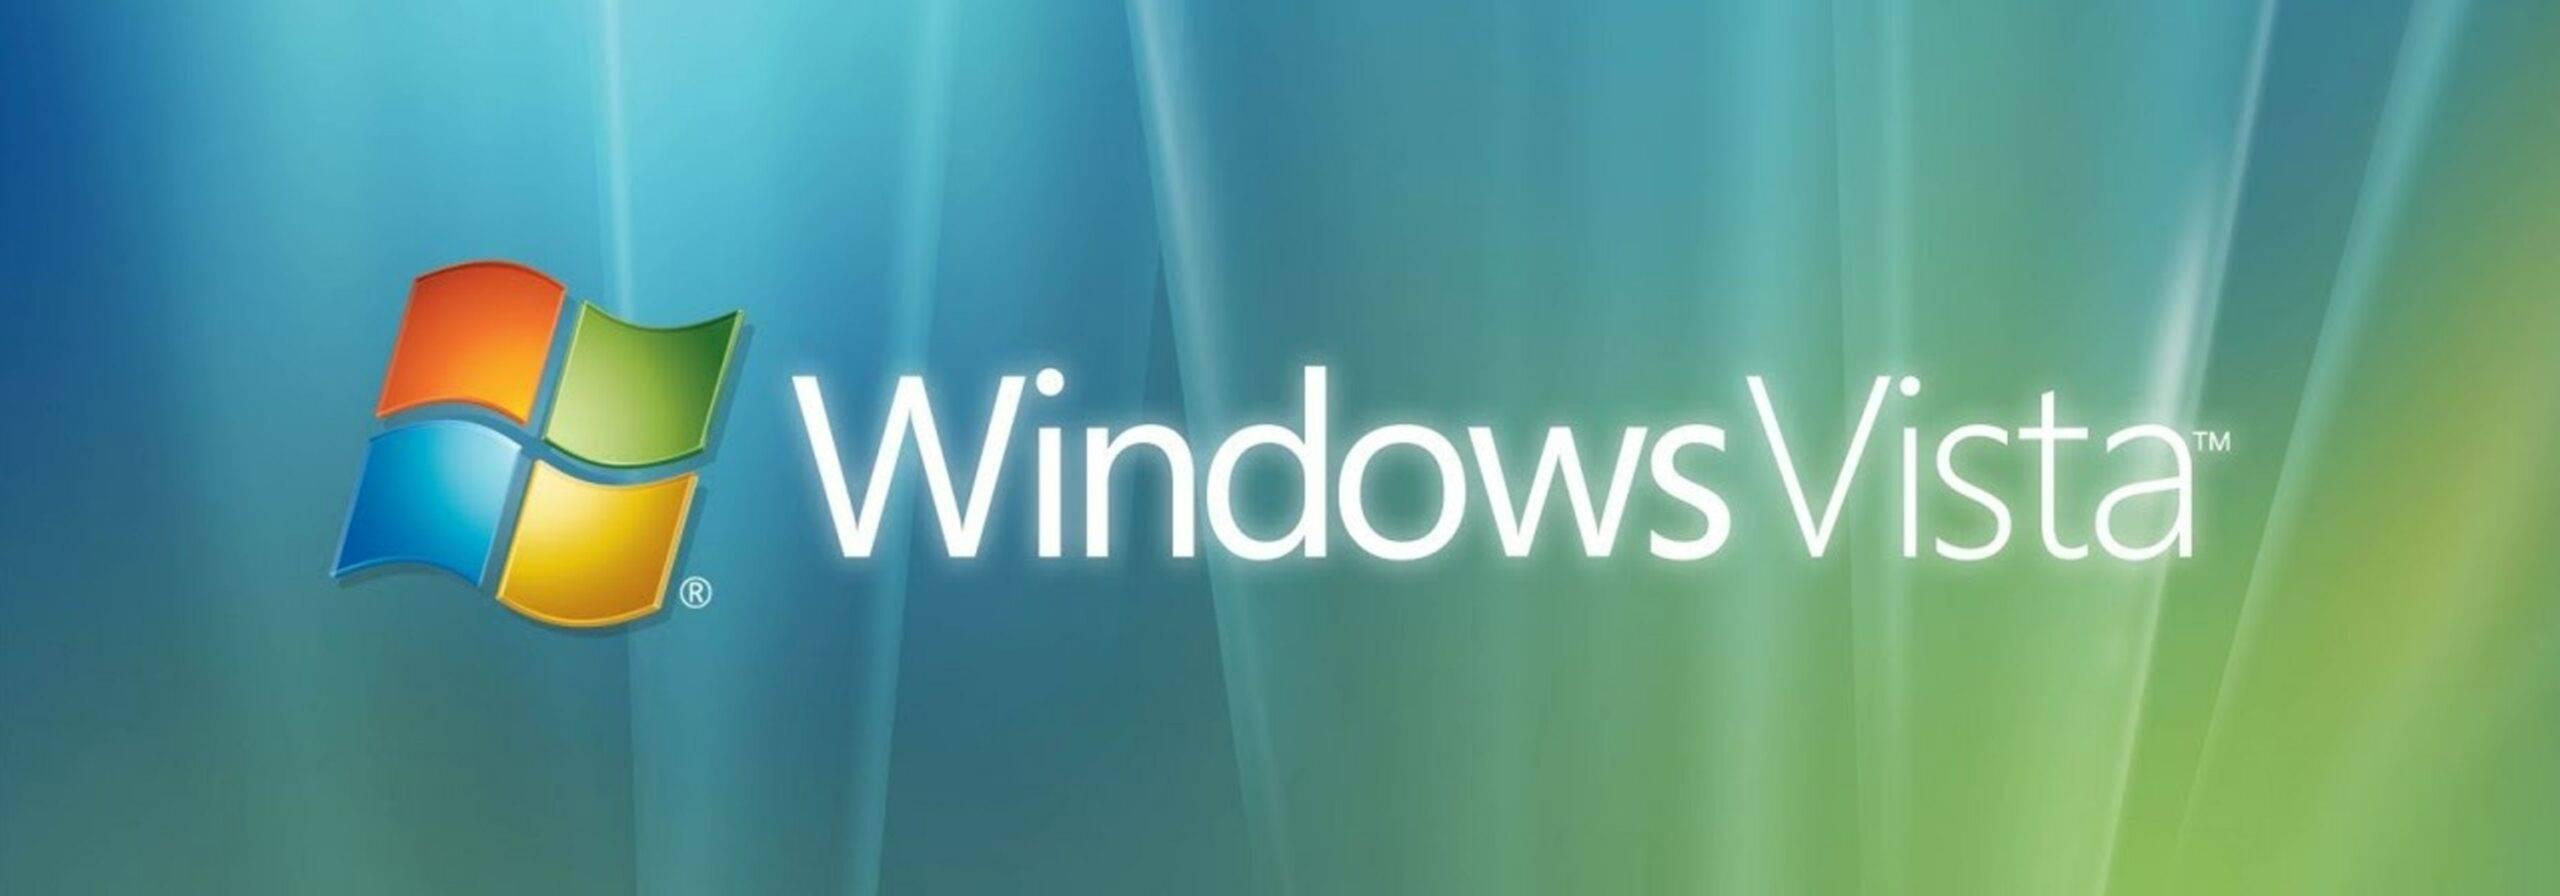 Microsoft's Windows Vista operating system